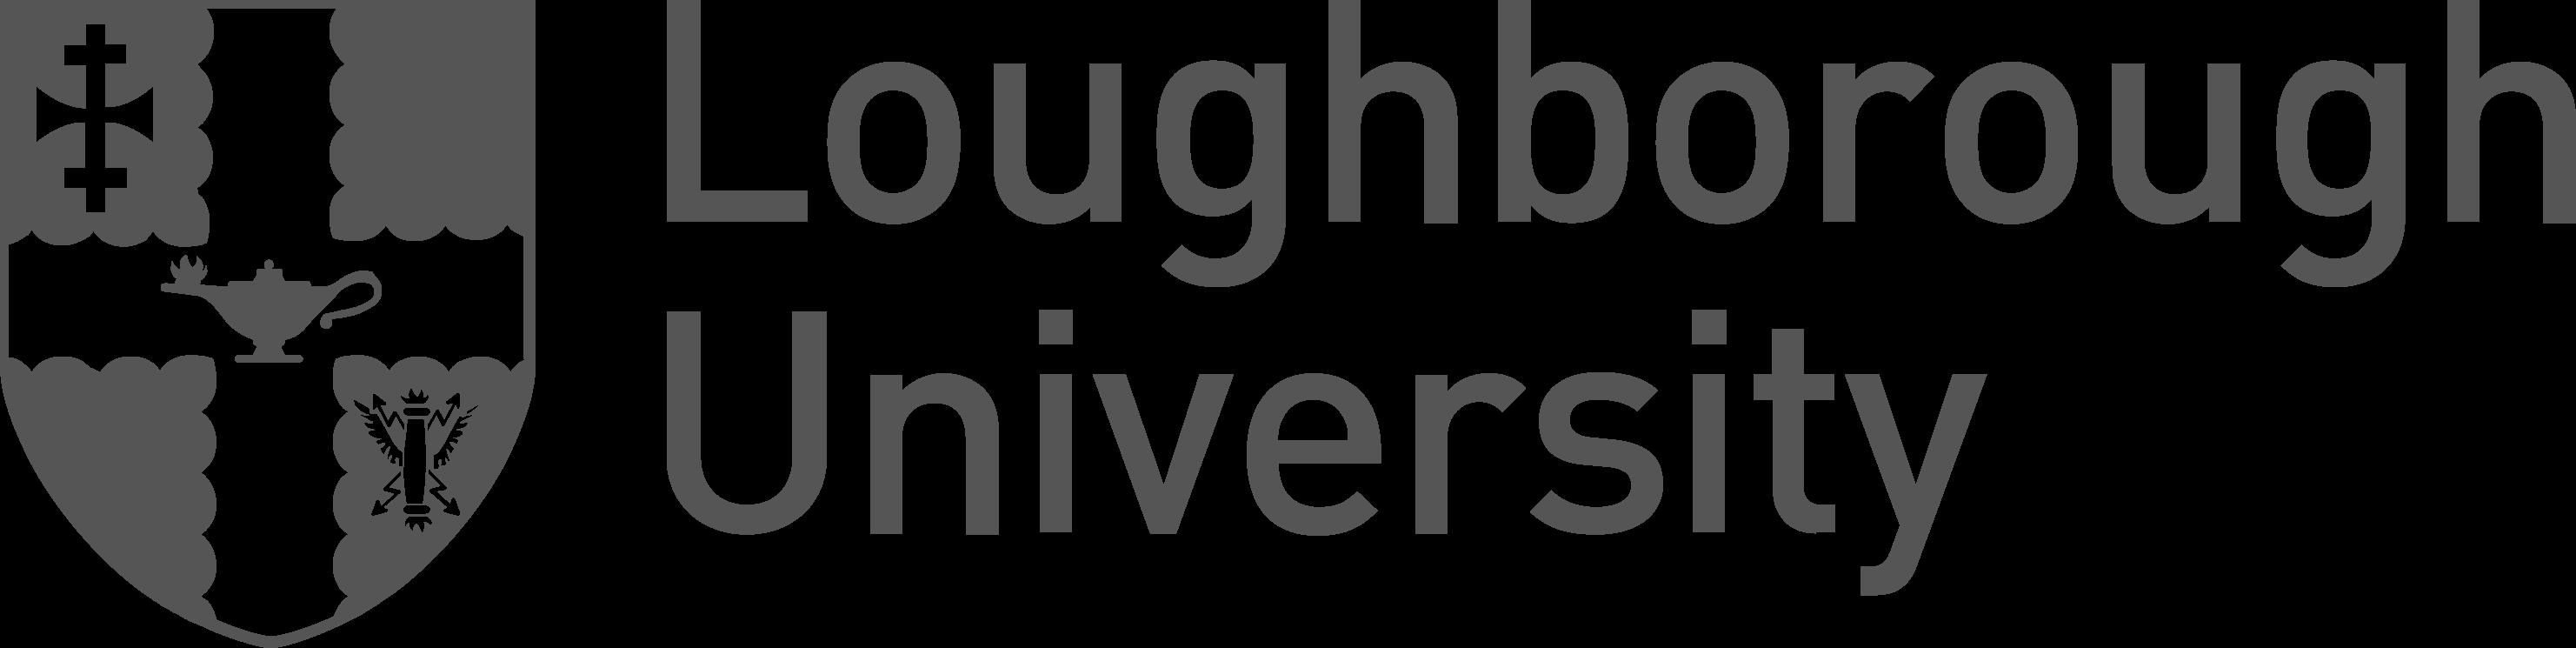 Loughborough University Logo png